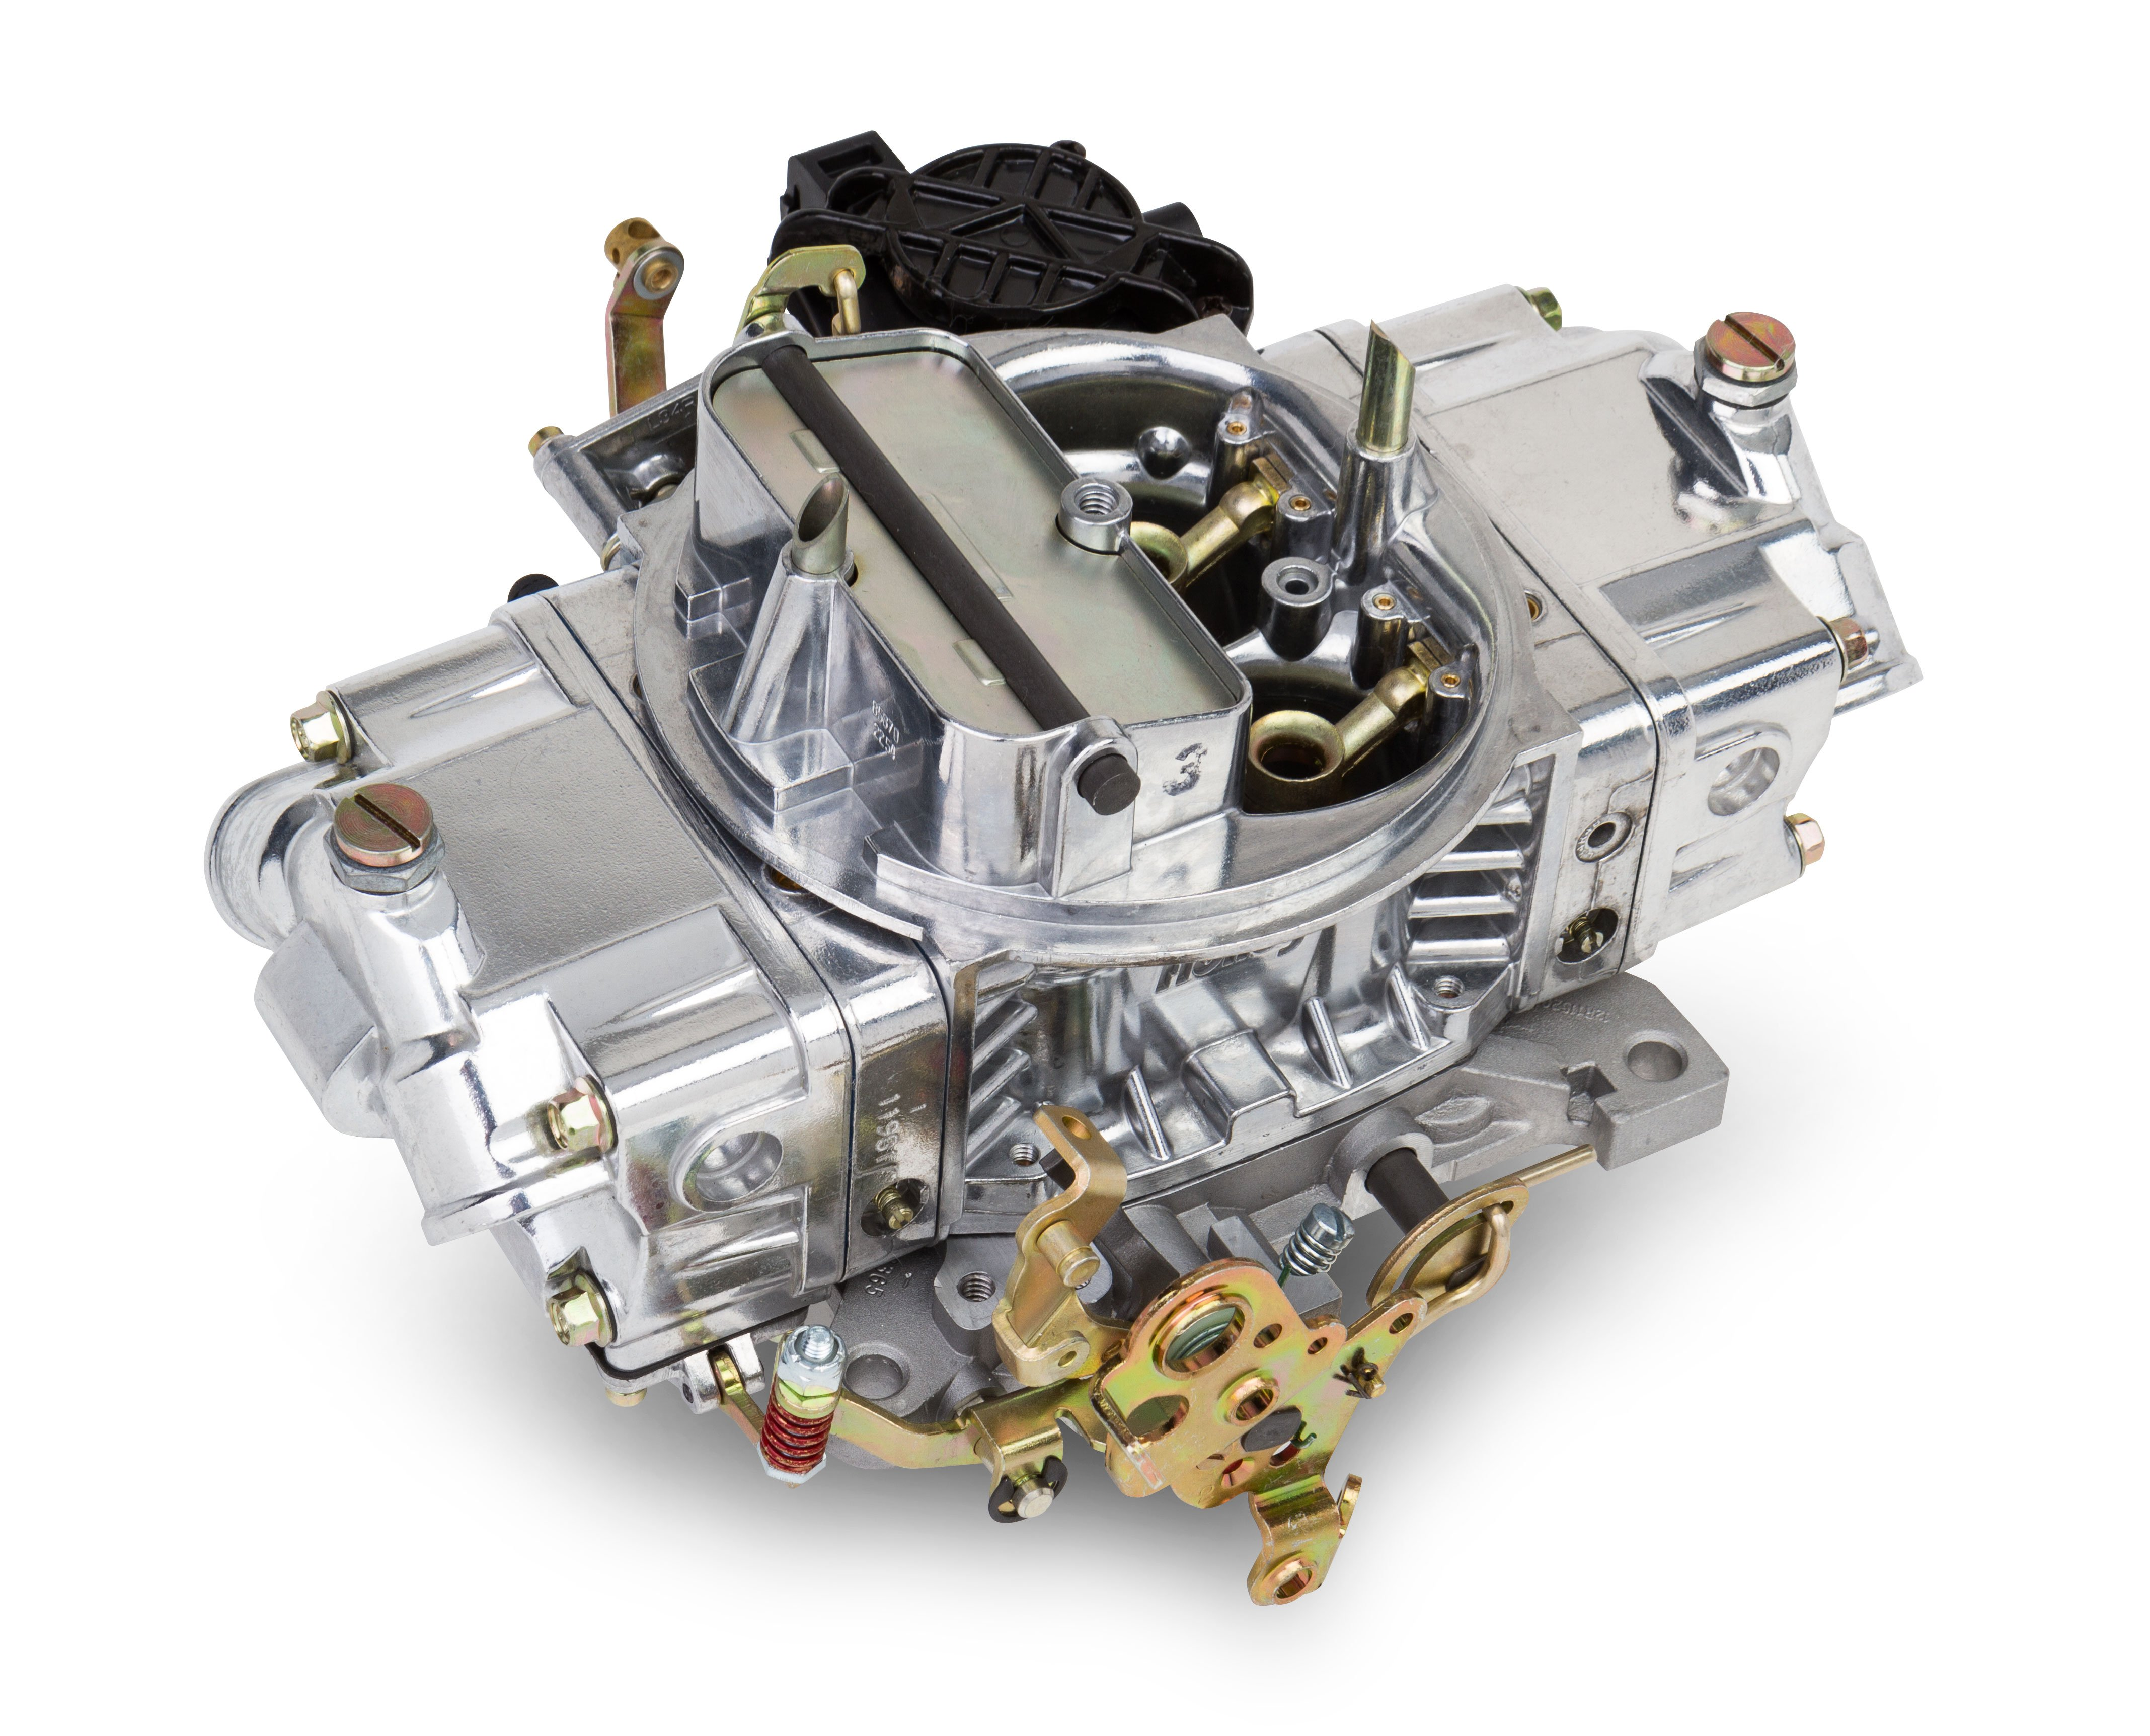 Holley 0-85770 770 CFM Street Avenger - Aluminum Carburetor